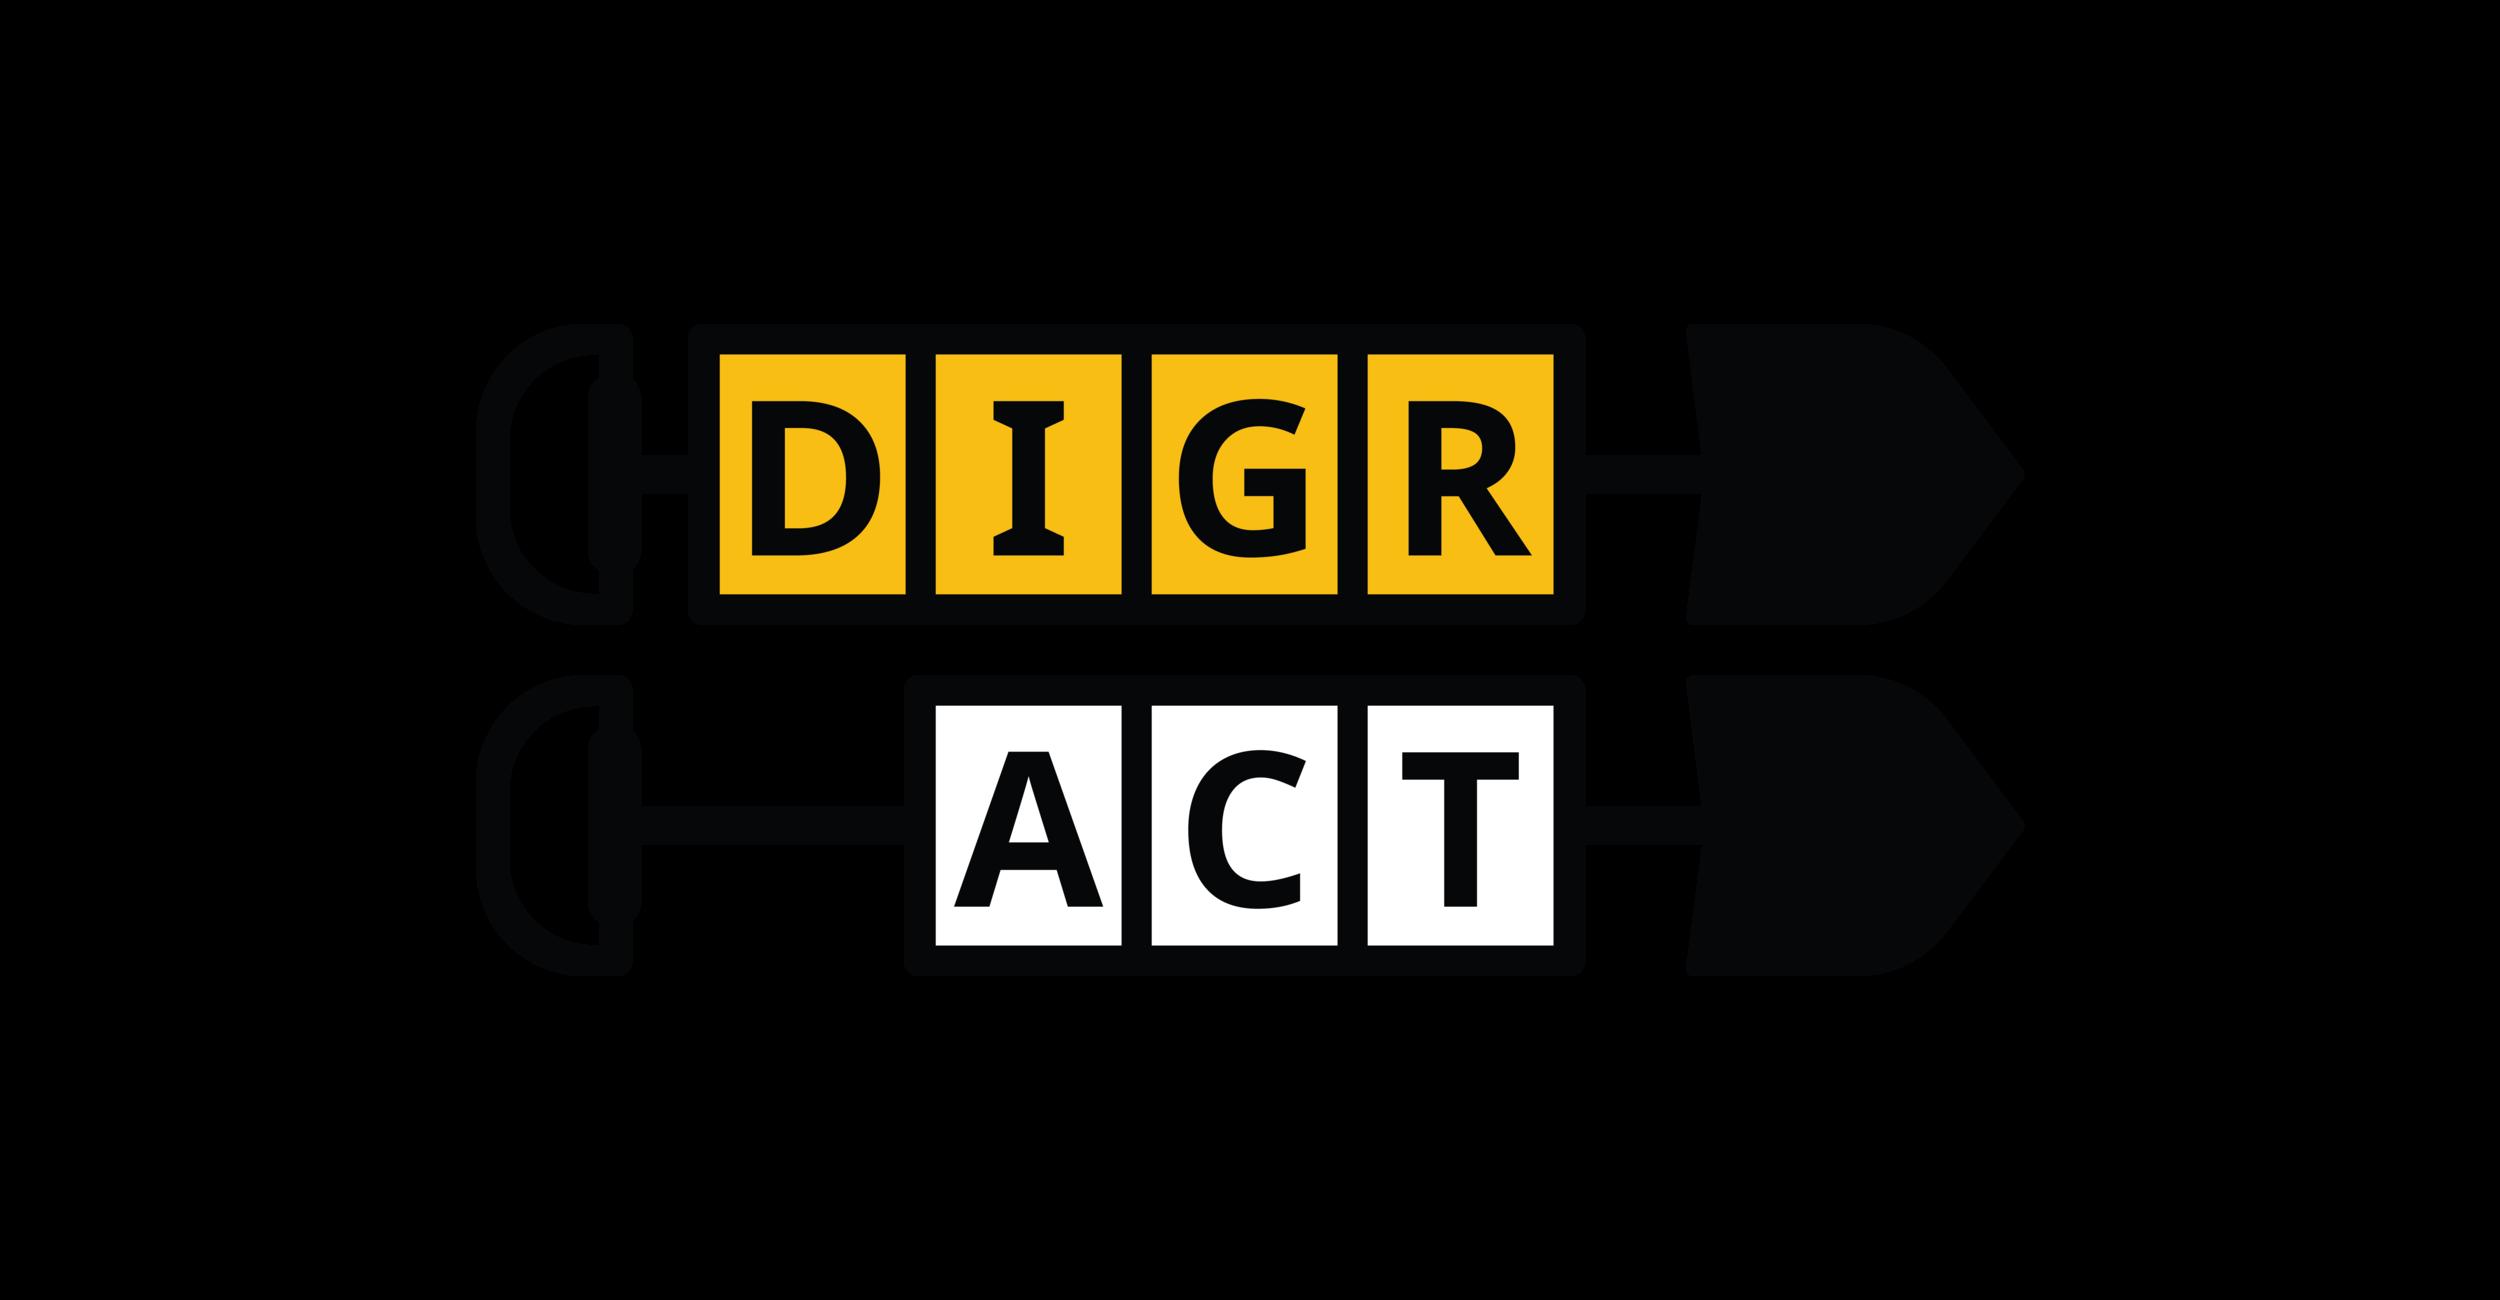 [P] DIGR-ACT_Stacked Logo - DIGR.png